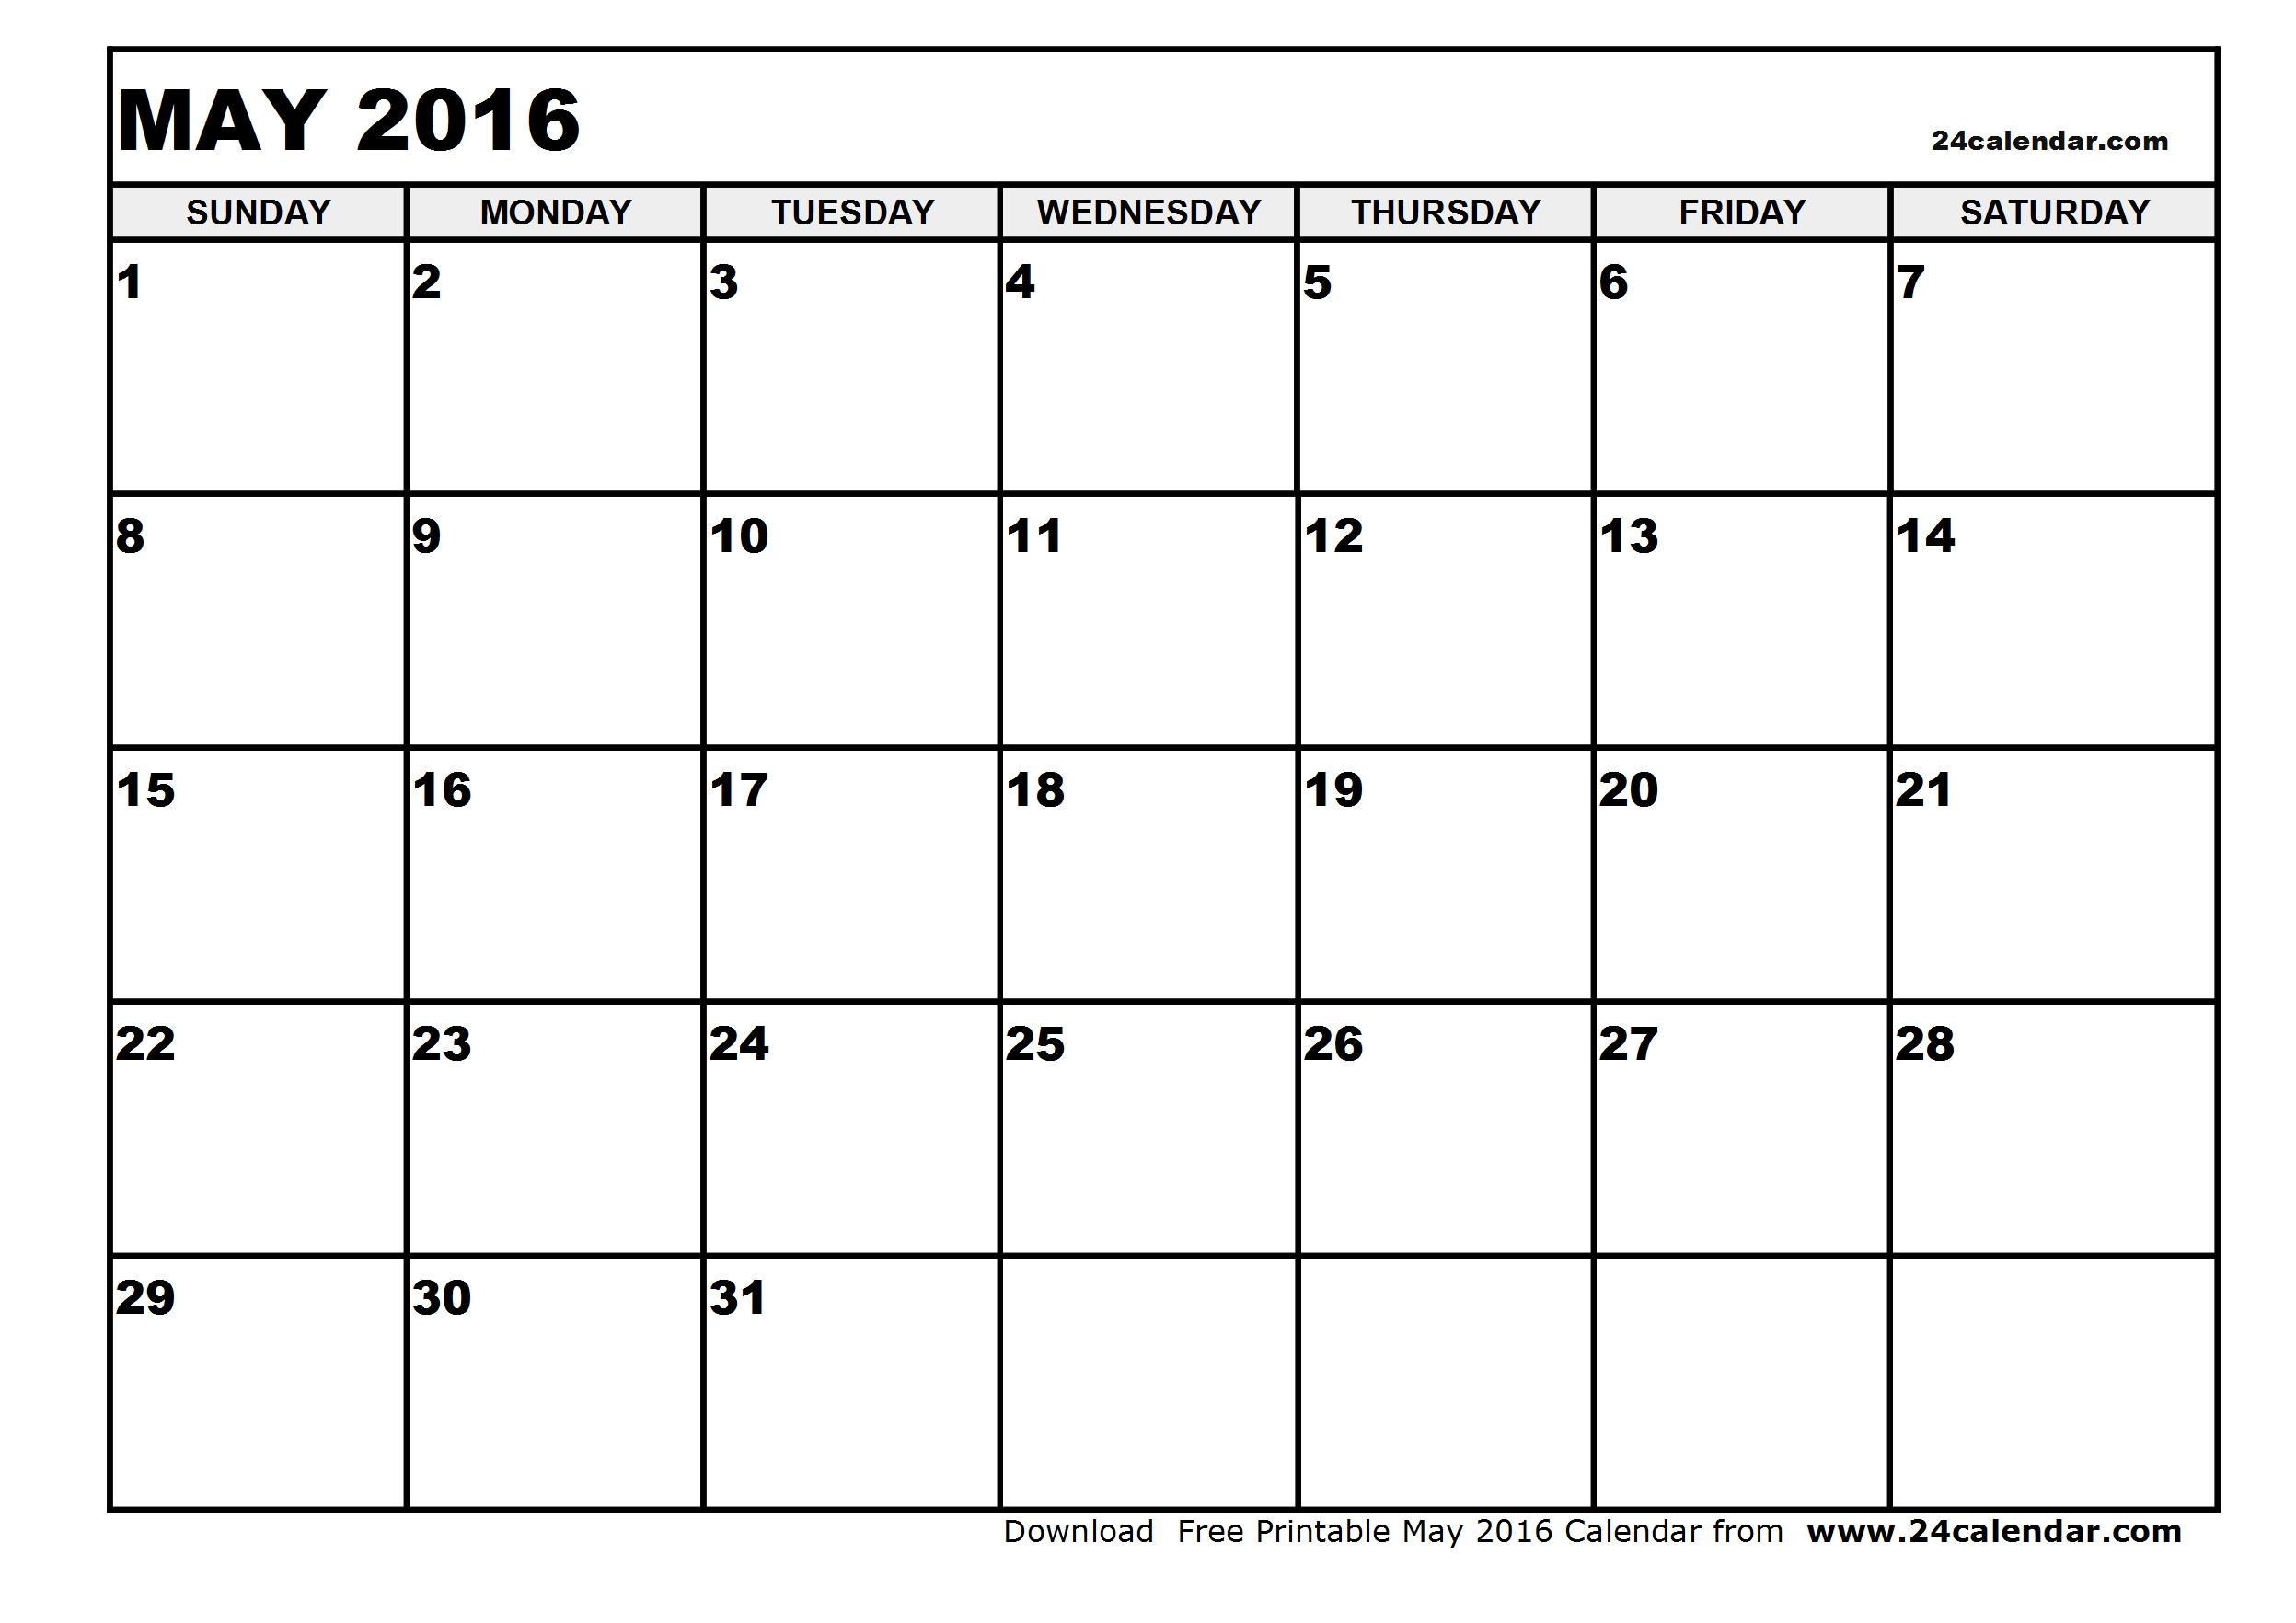 May 2016 calendar | May 2016 calendar printable